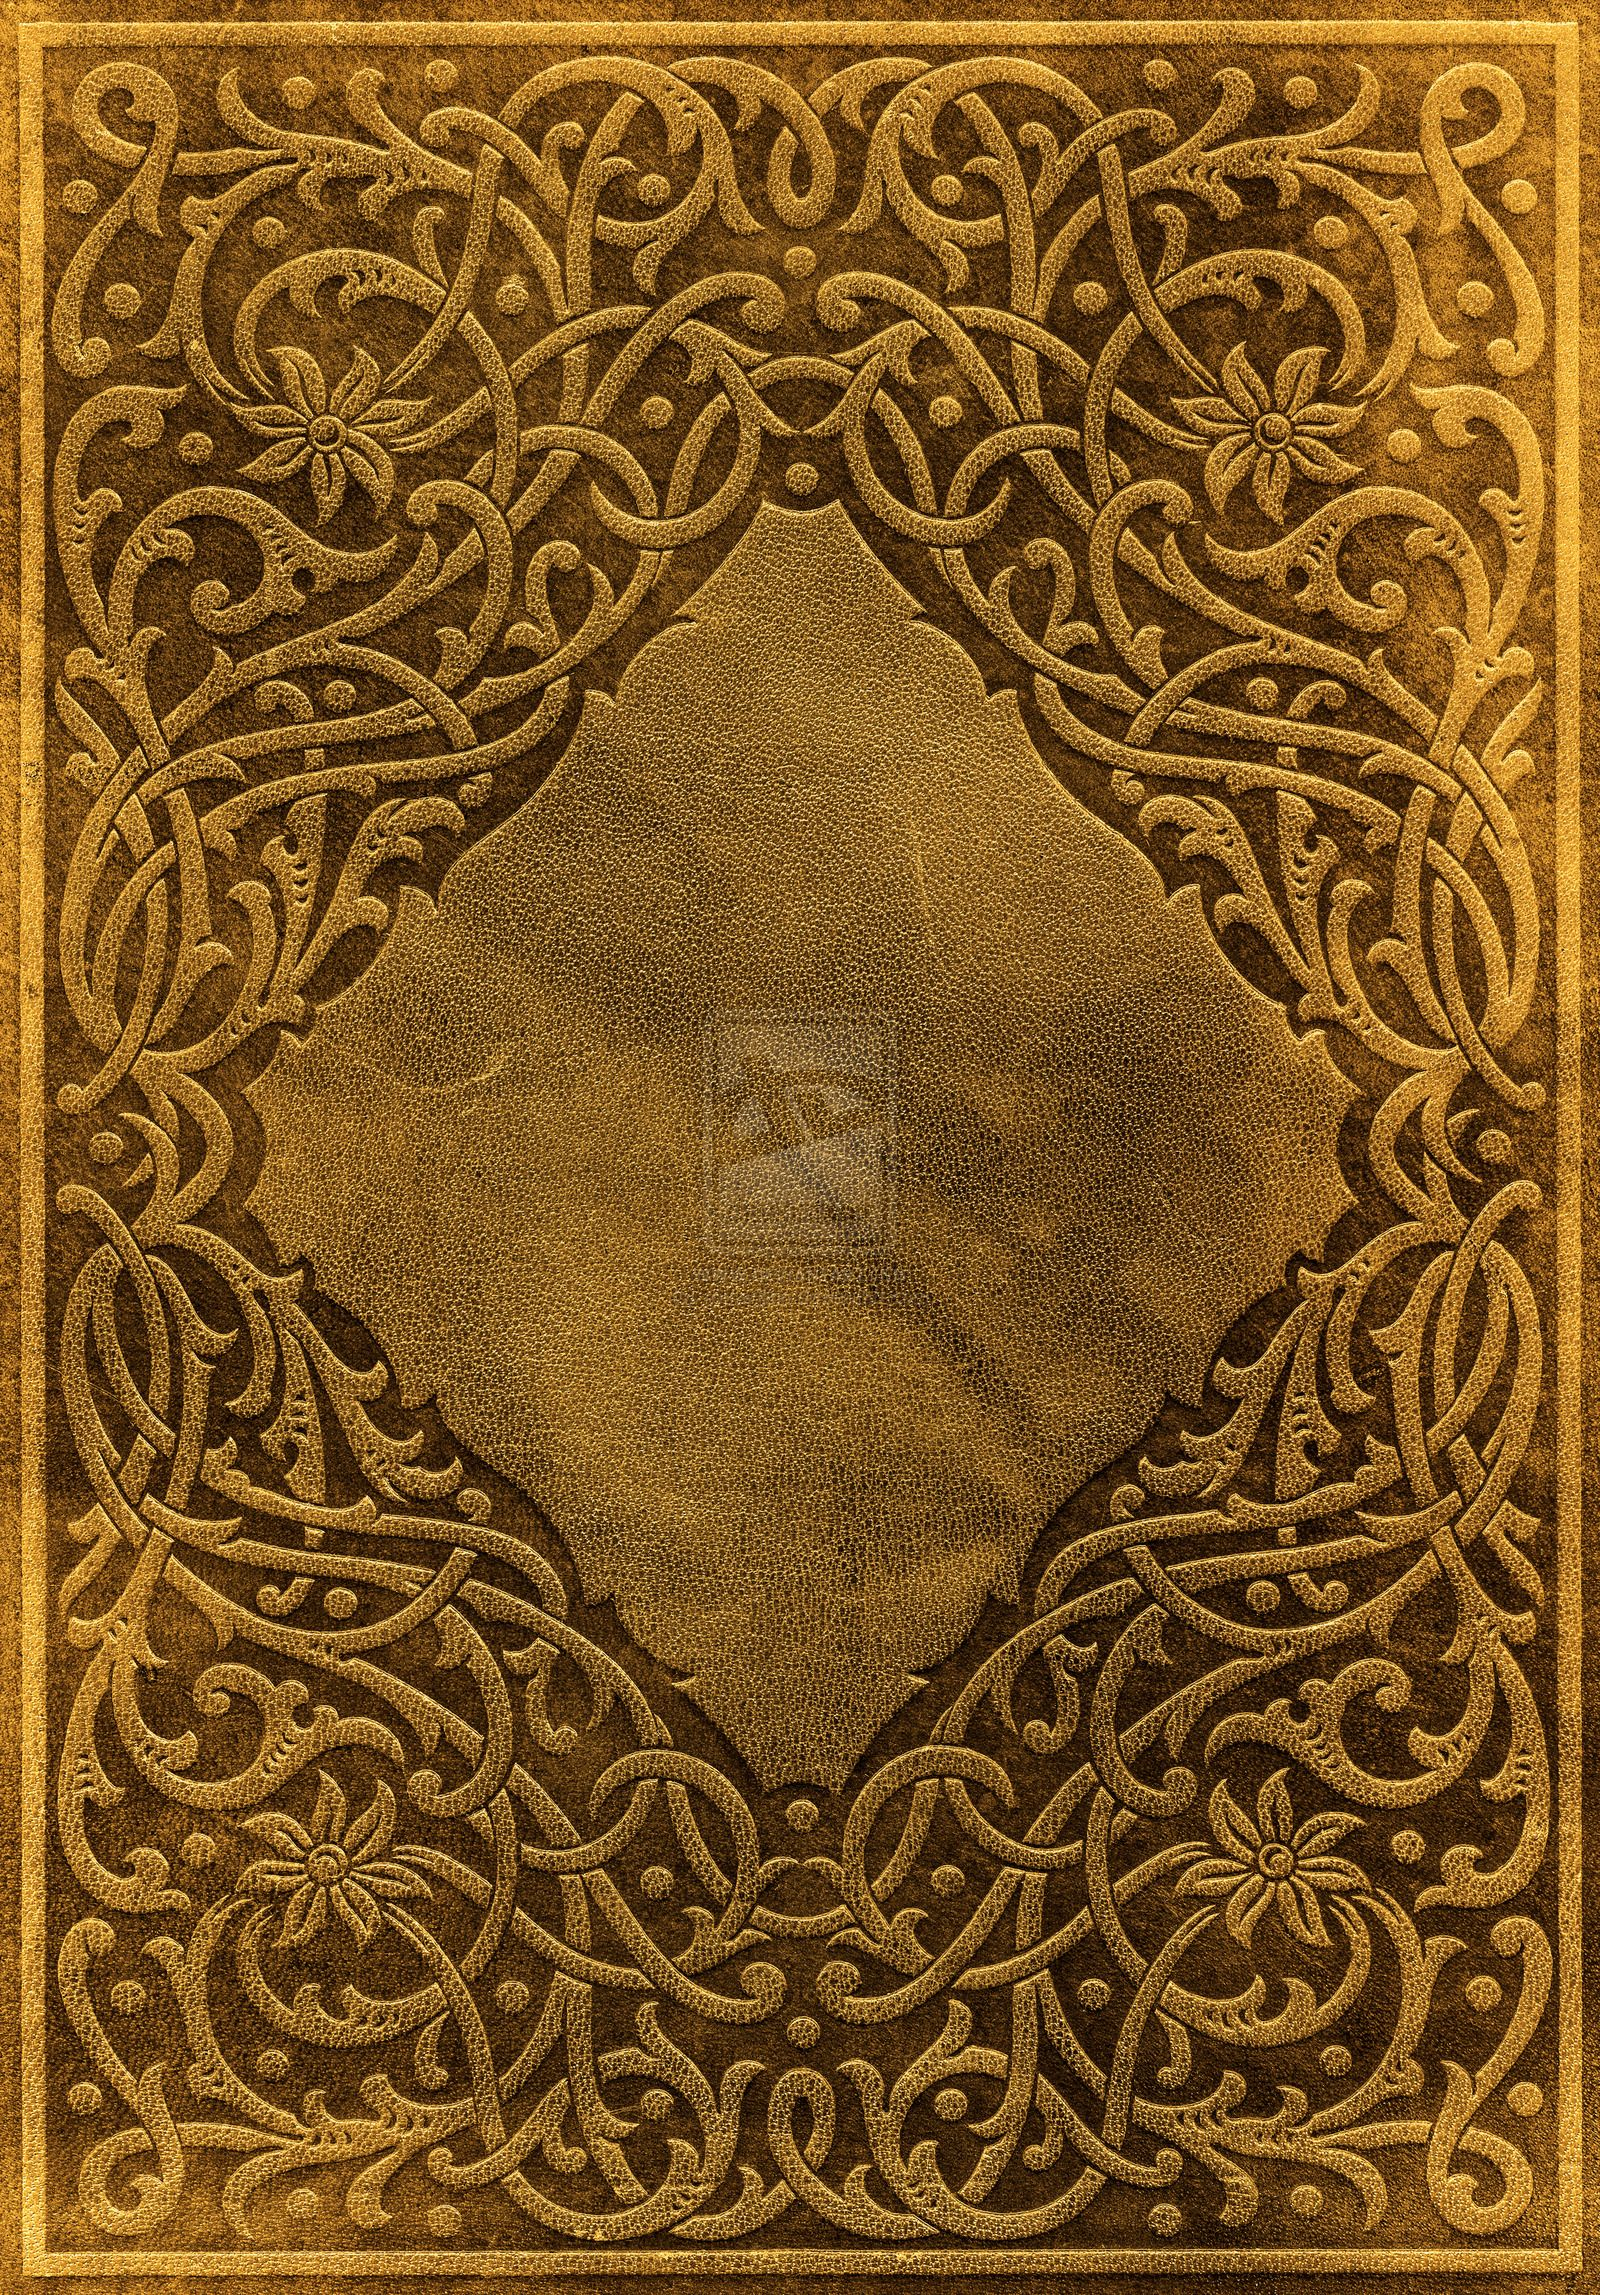 Old Book Designs Google Search Book Cover Template Vintage Book Cover Vintage Book Covers